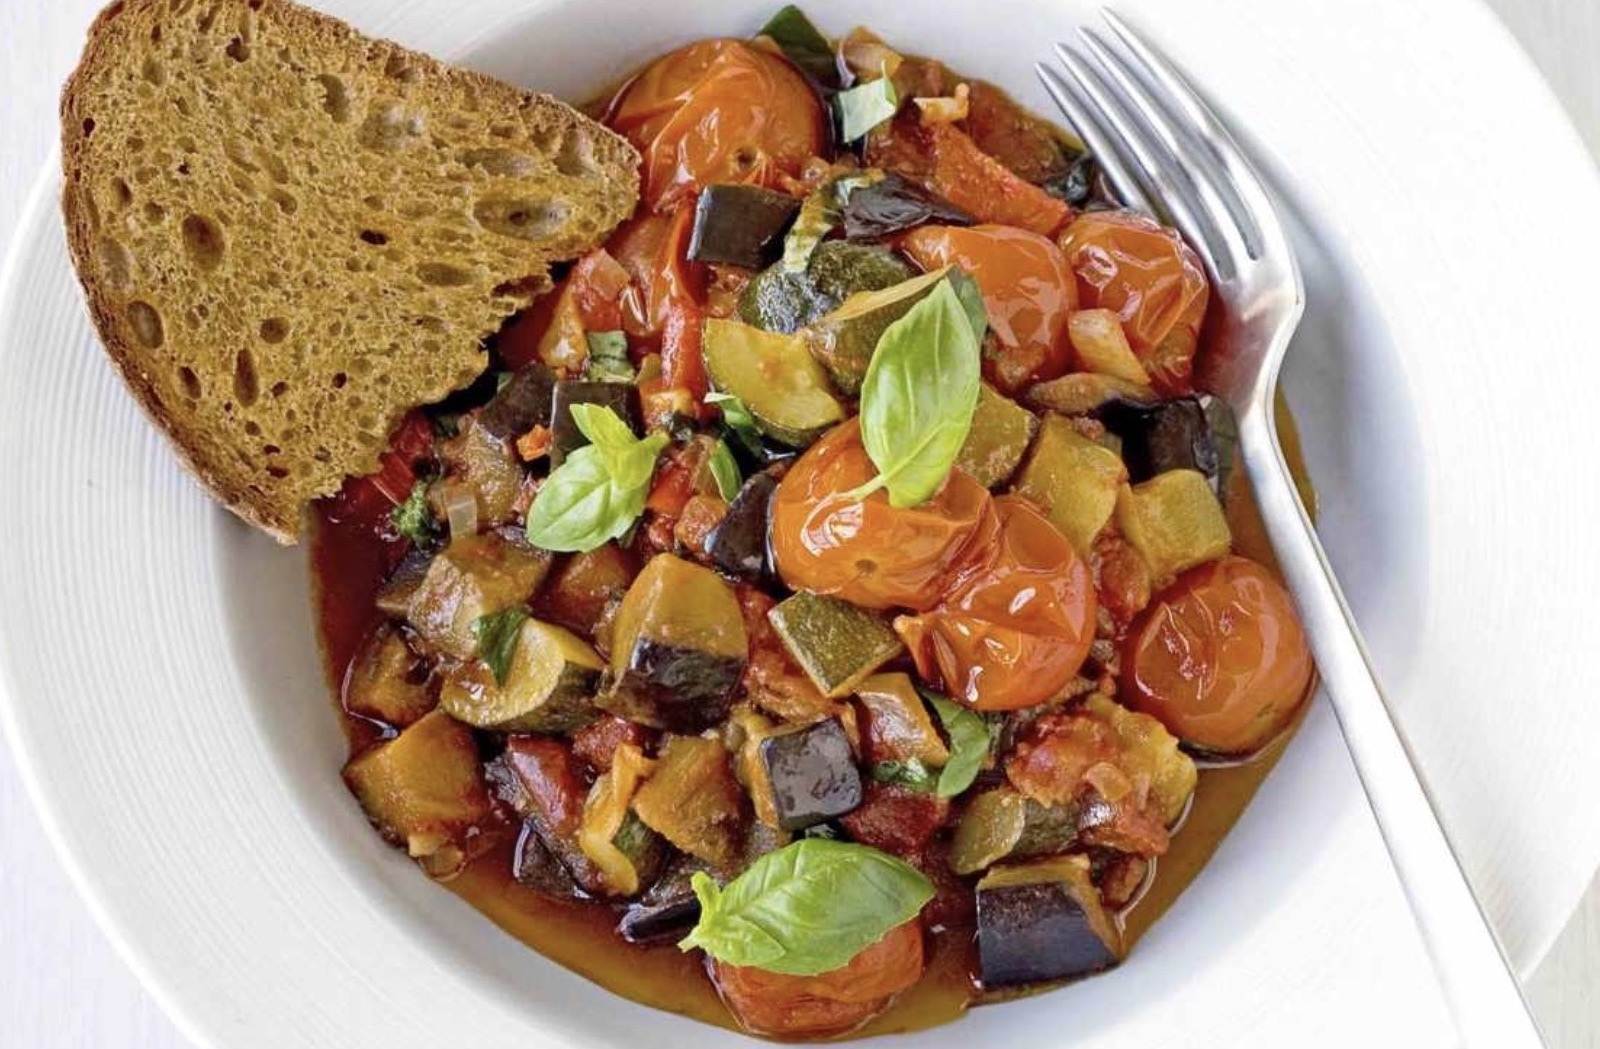 vegan ratatouille - vegan recept - veganistische resepten